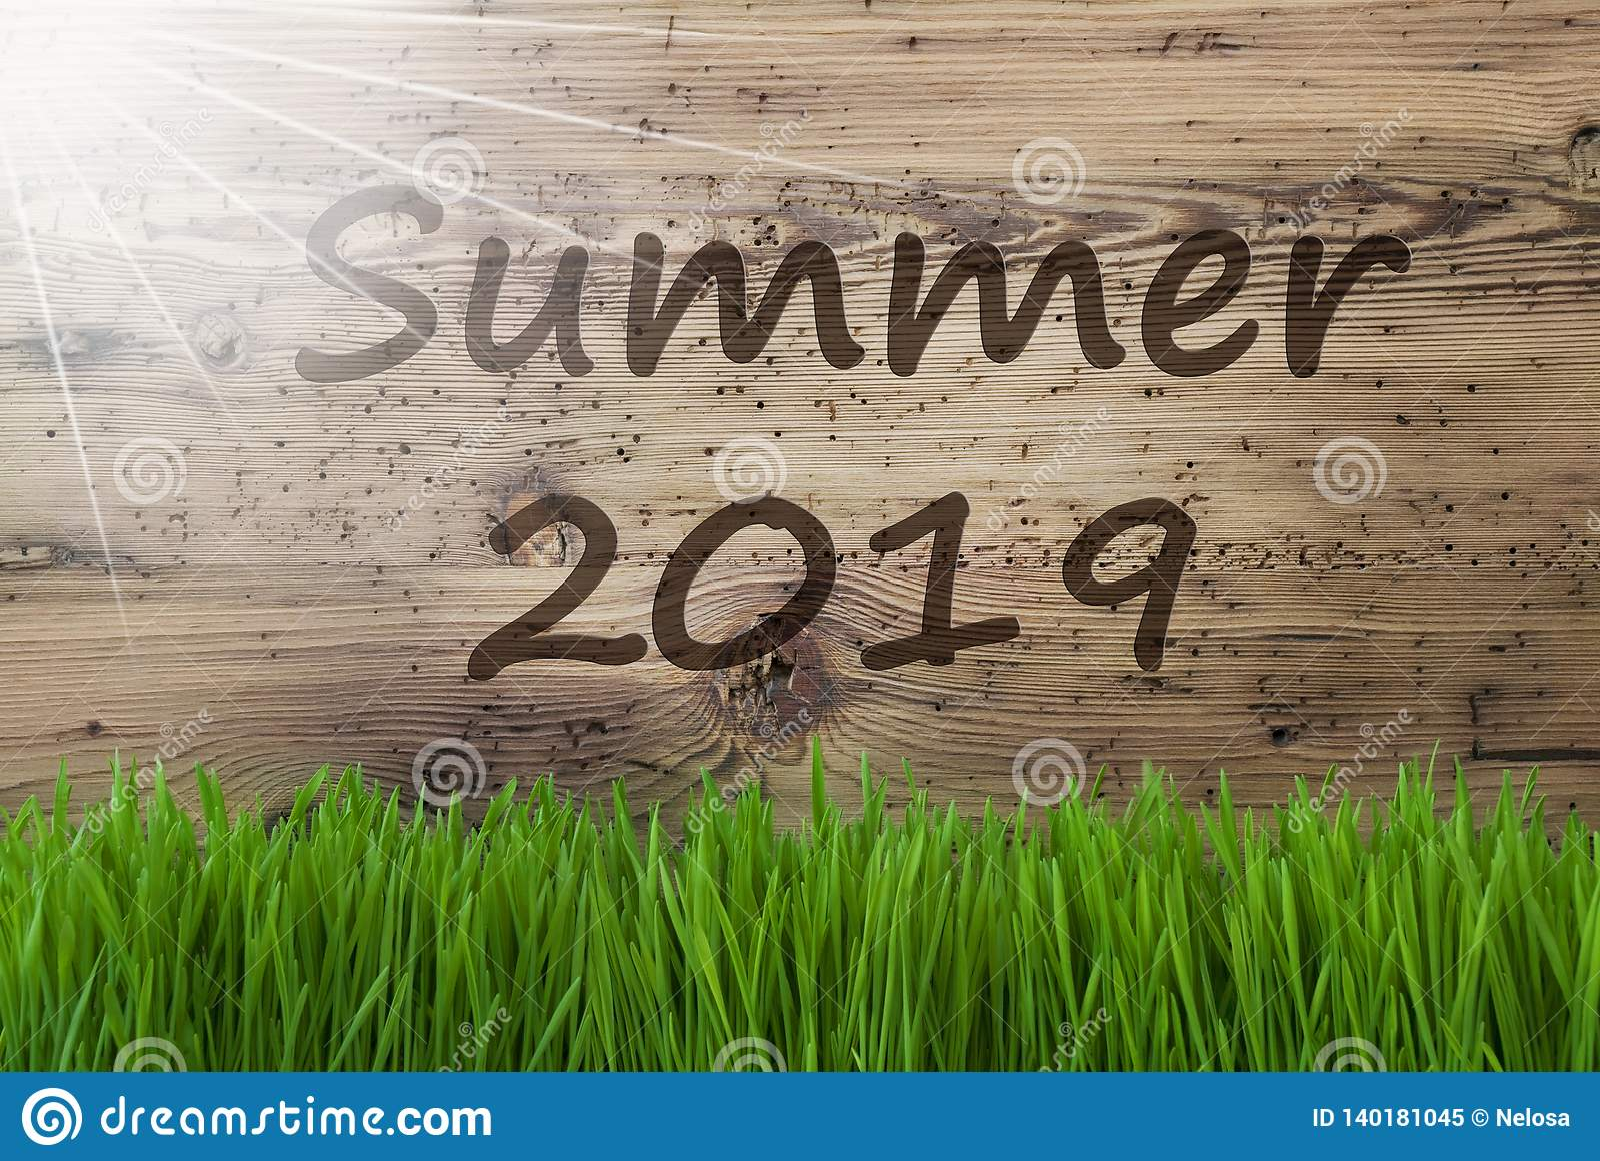 Sunny Wooden Background, herbe, été anglais 2019 des textes